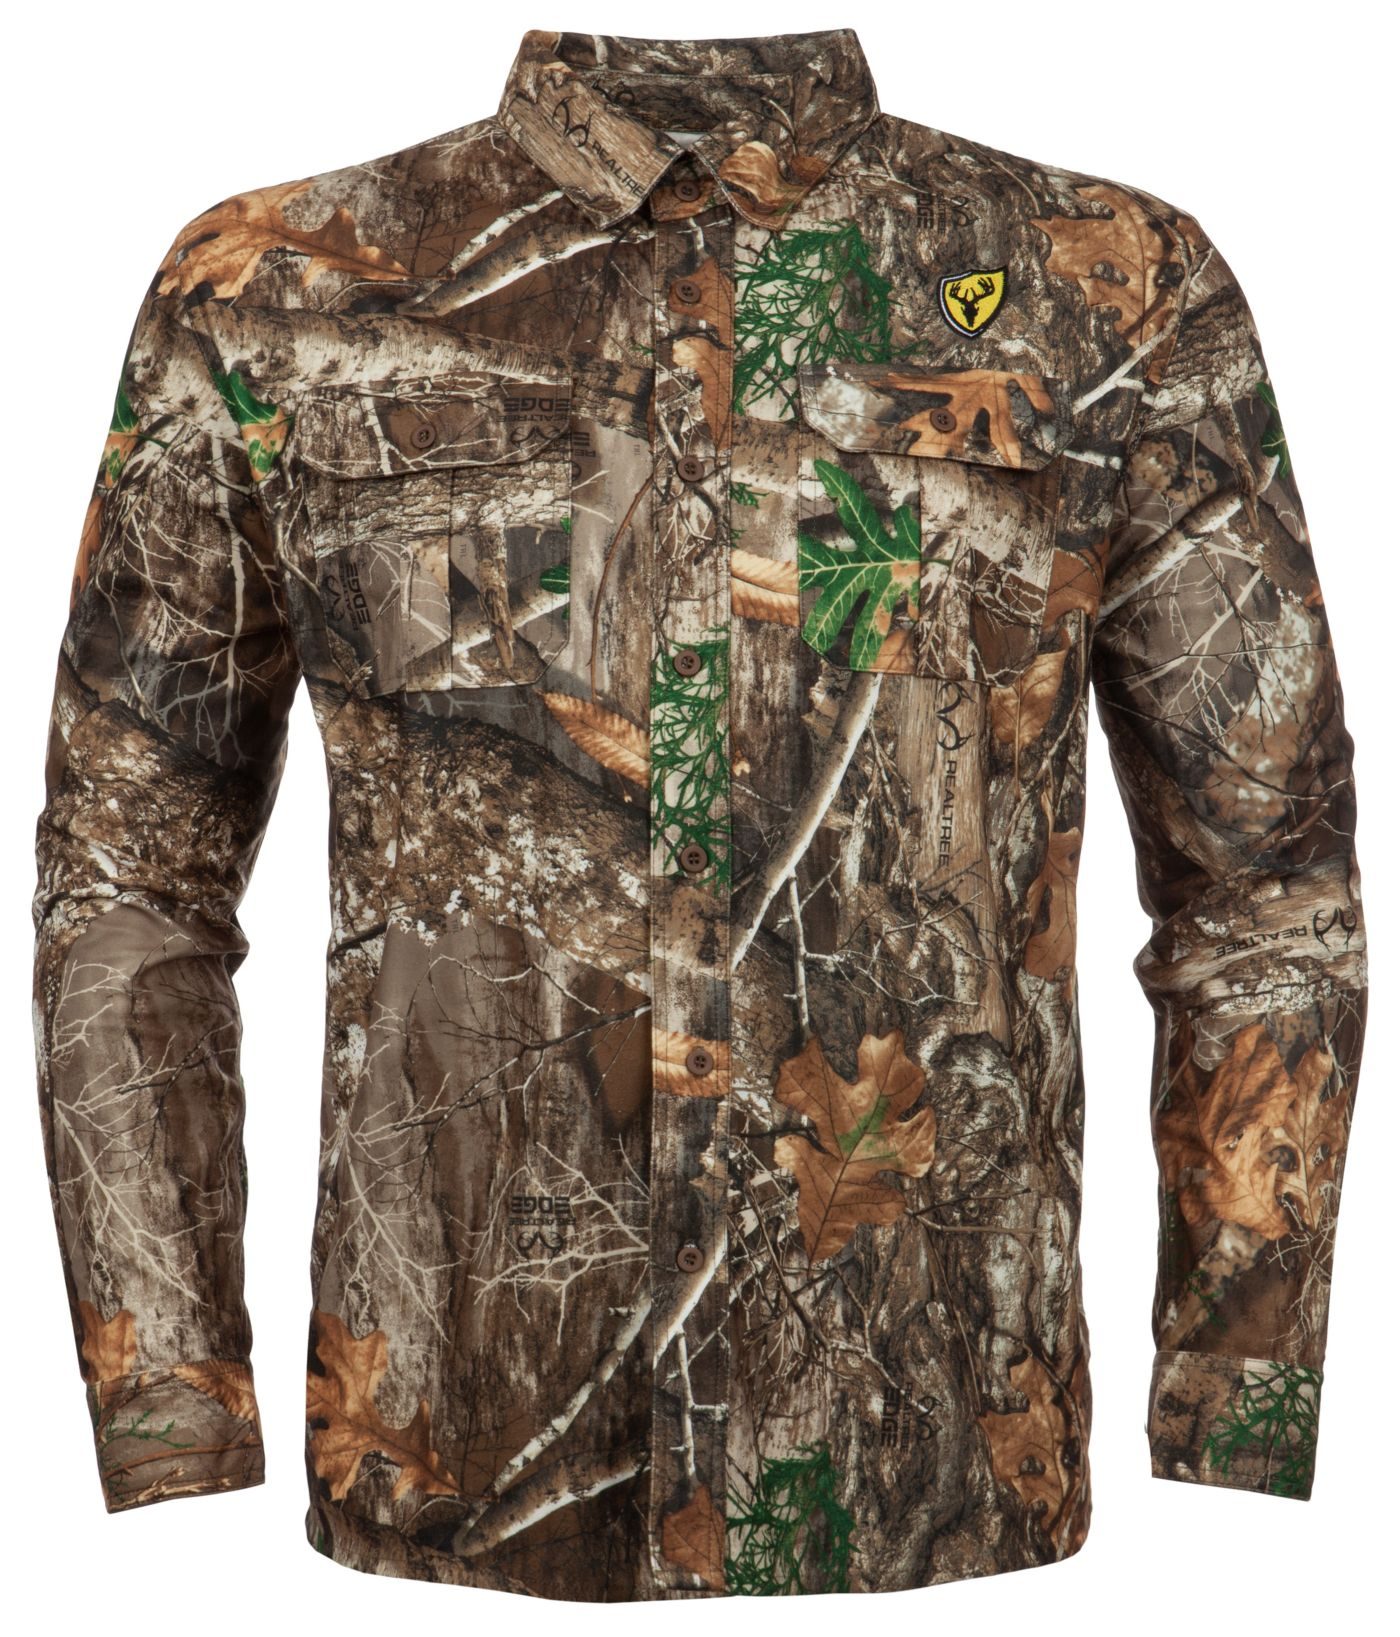 Blocker Outdoors Men's Shield Series Terratec Shirt